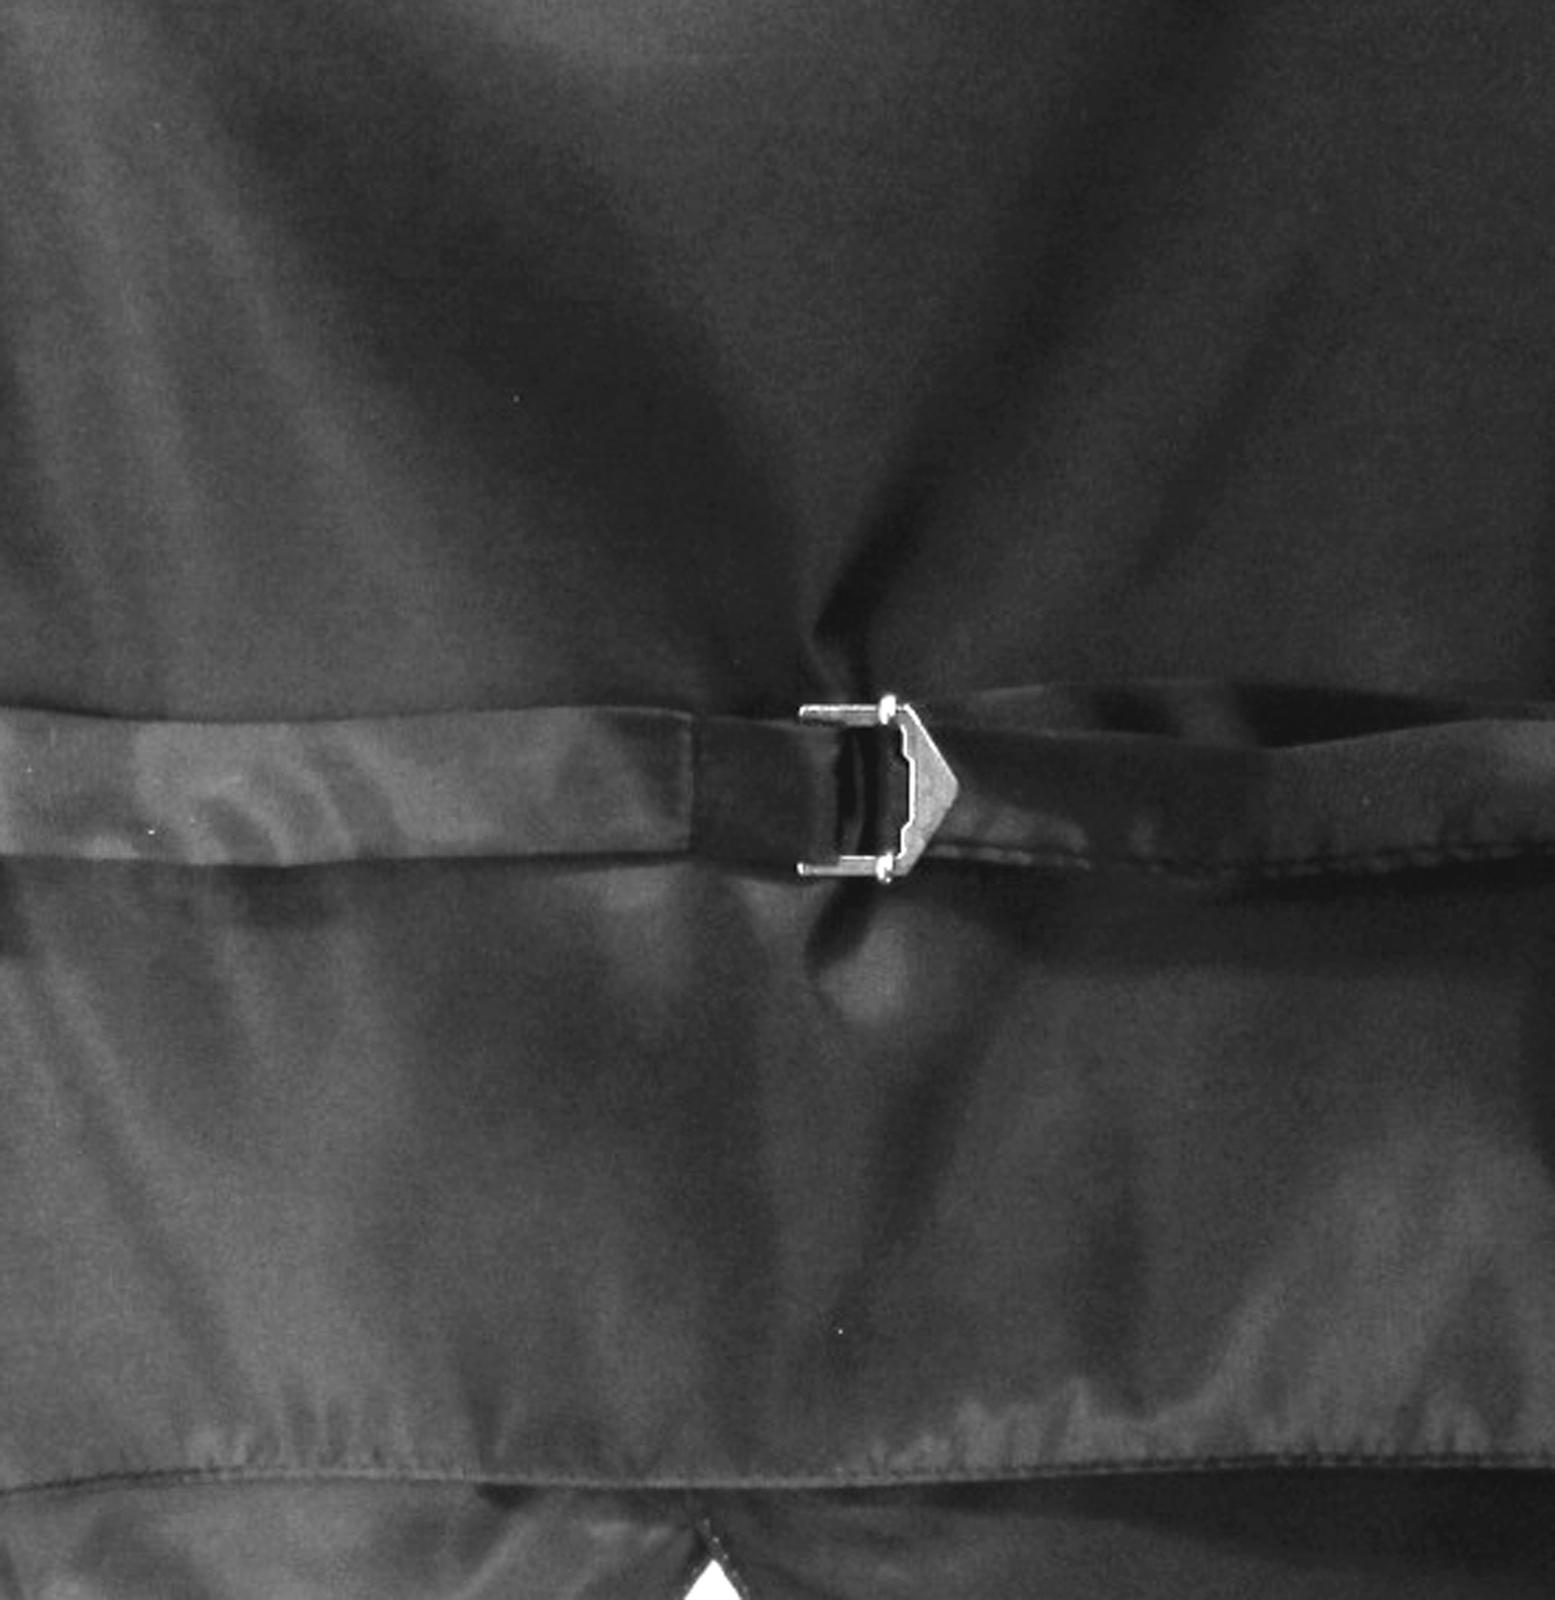 New Men's Formal Tuxedo Vest Waistcoat solid & Ascot cravat dark purple eggplant